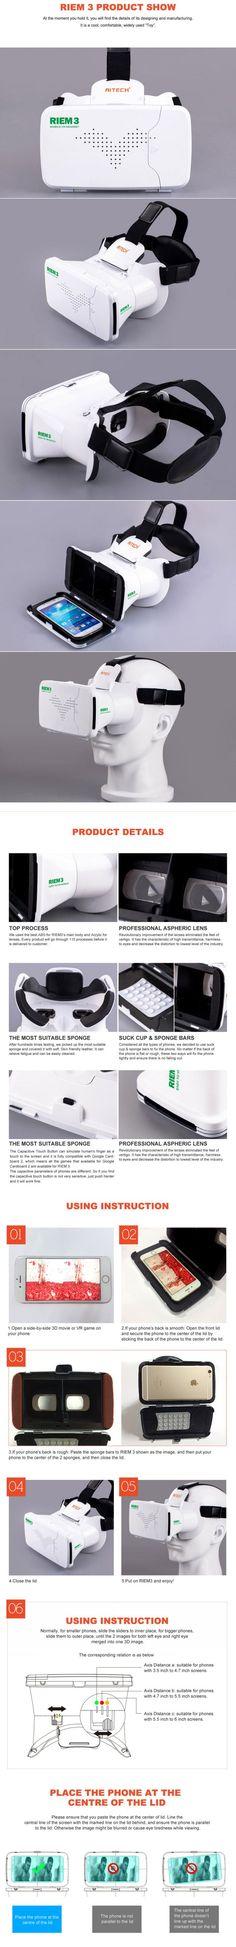 Ritech III RIEM3 3D VR Glasses Virtual Reality Headset